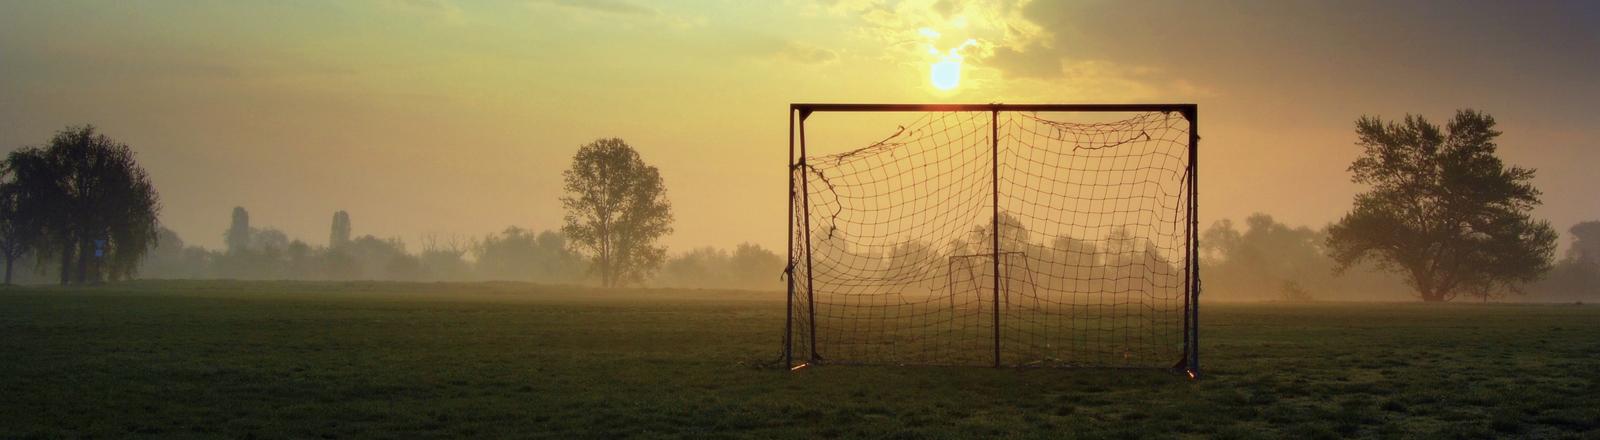 Sonnenuntergang mit Fußballtor